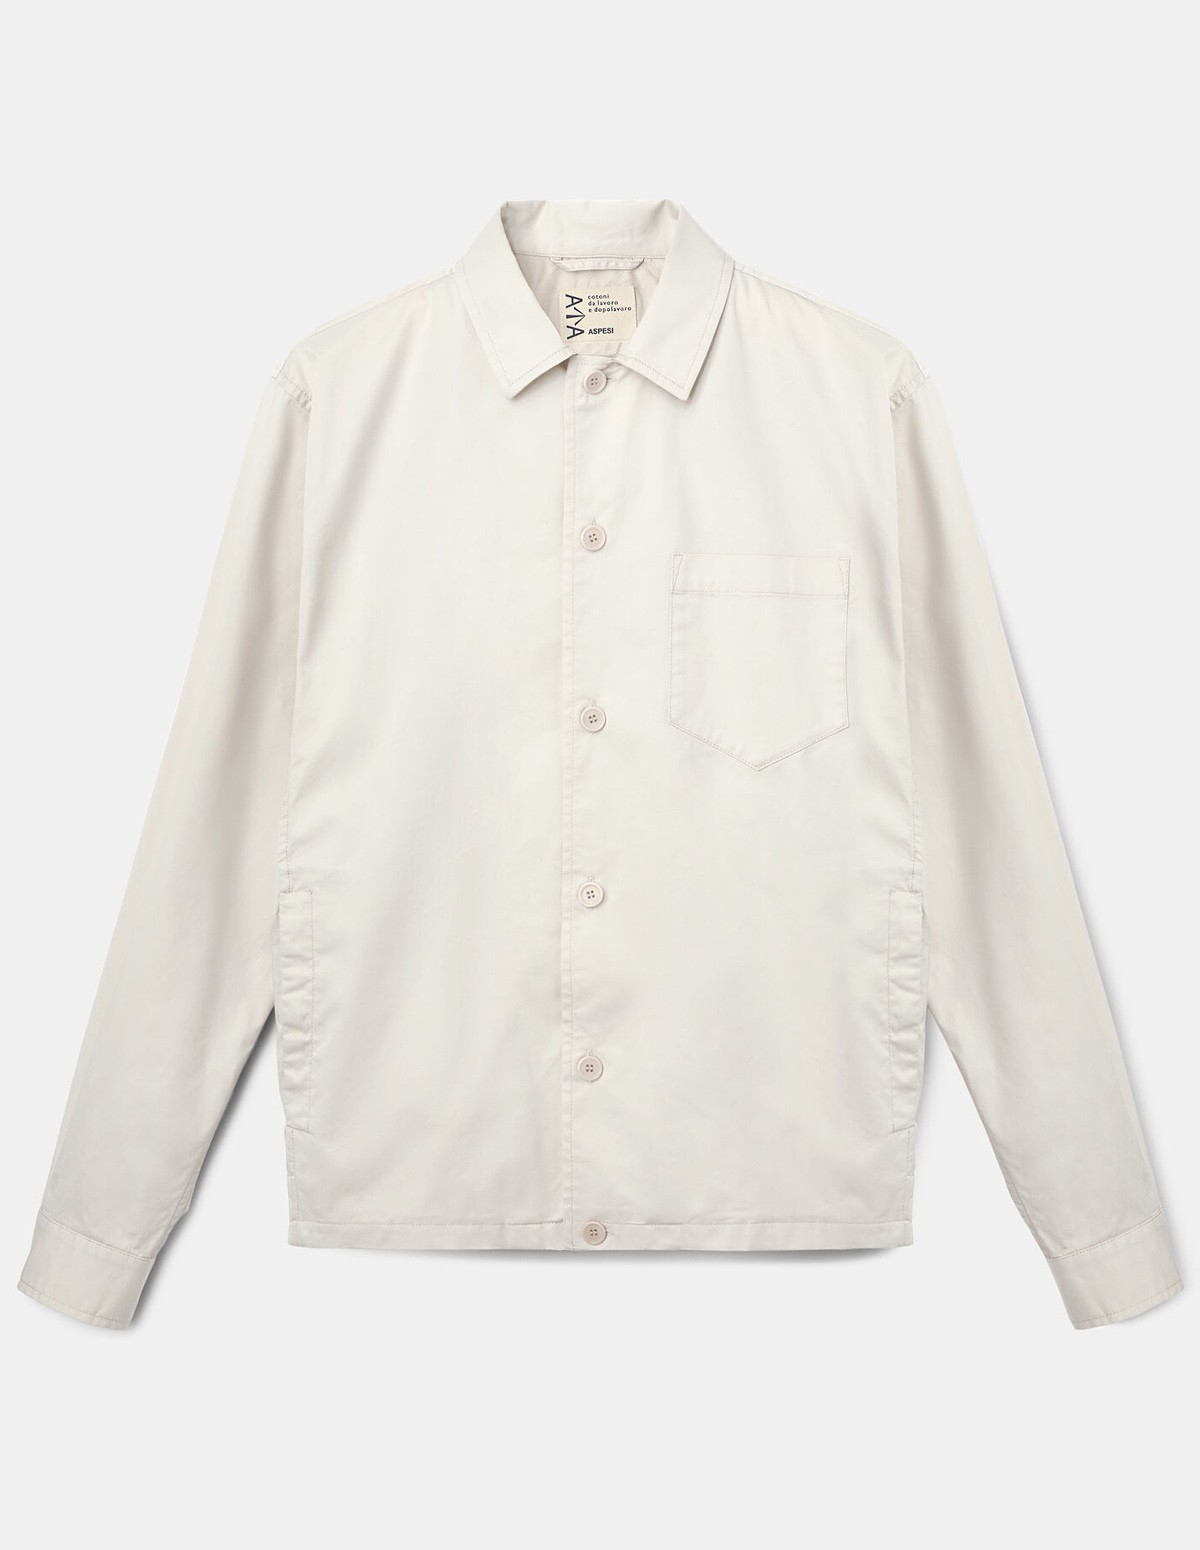 Aspesi Shirt Jacket